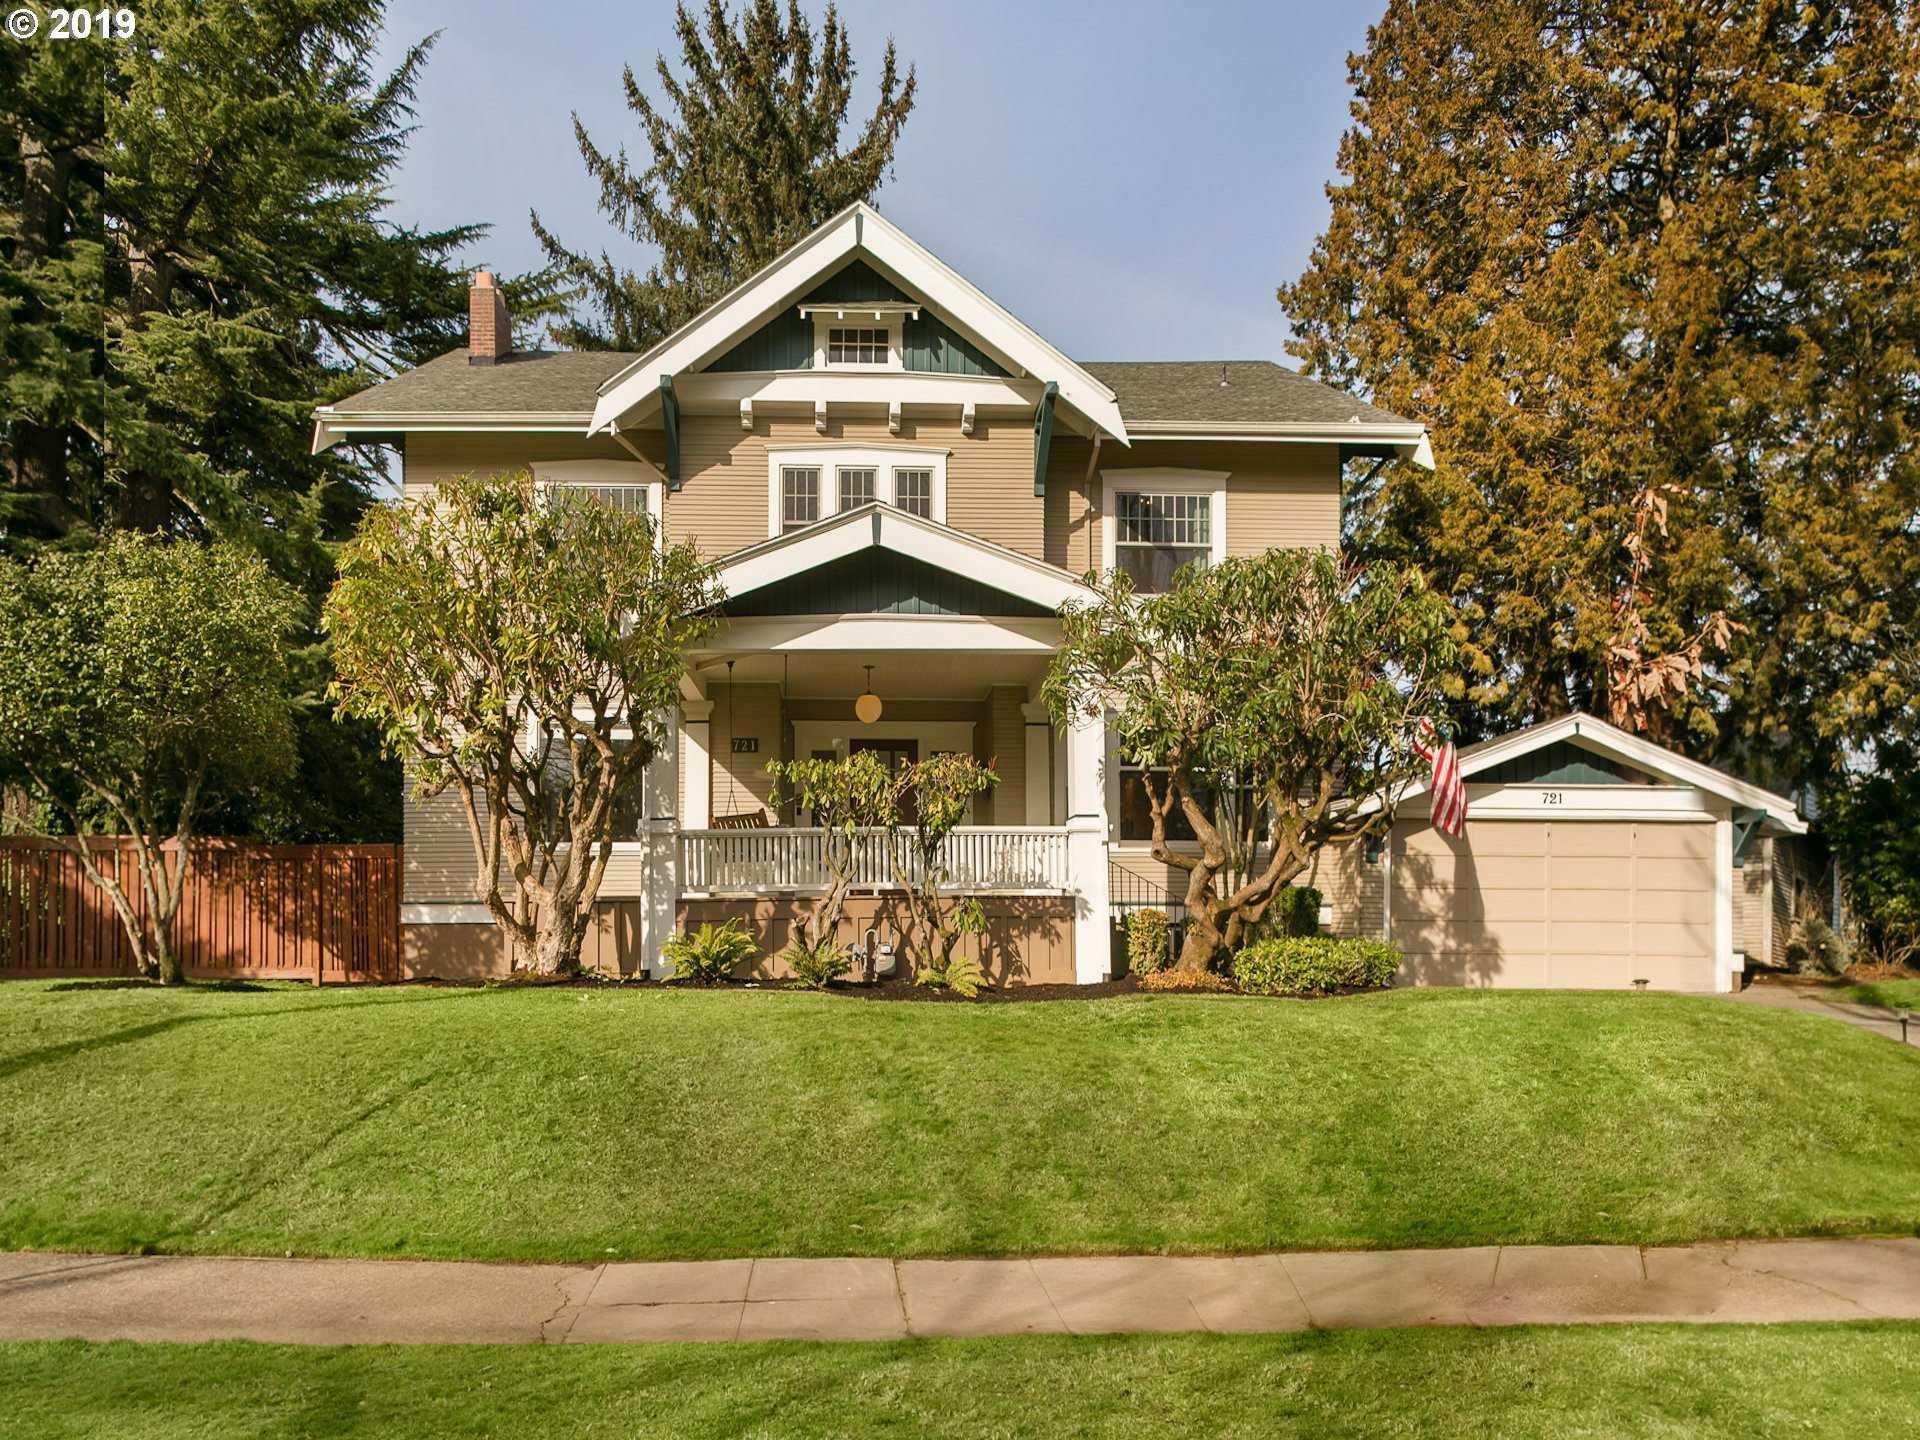 $1,300,000 - 4Br/3Ba -  for Sale in Laurelhurst, Portland